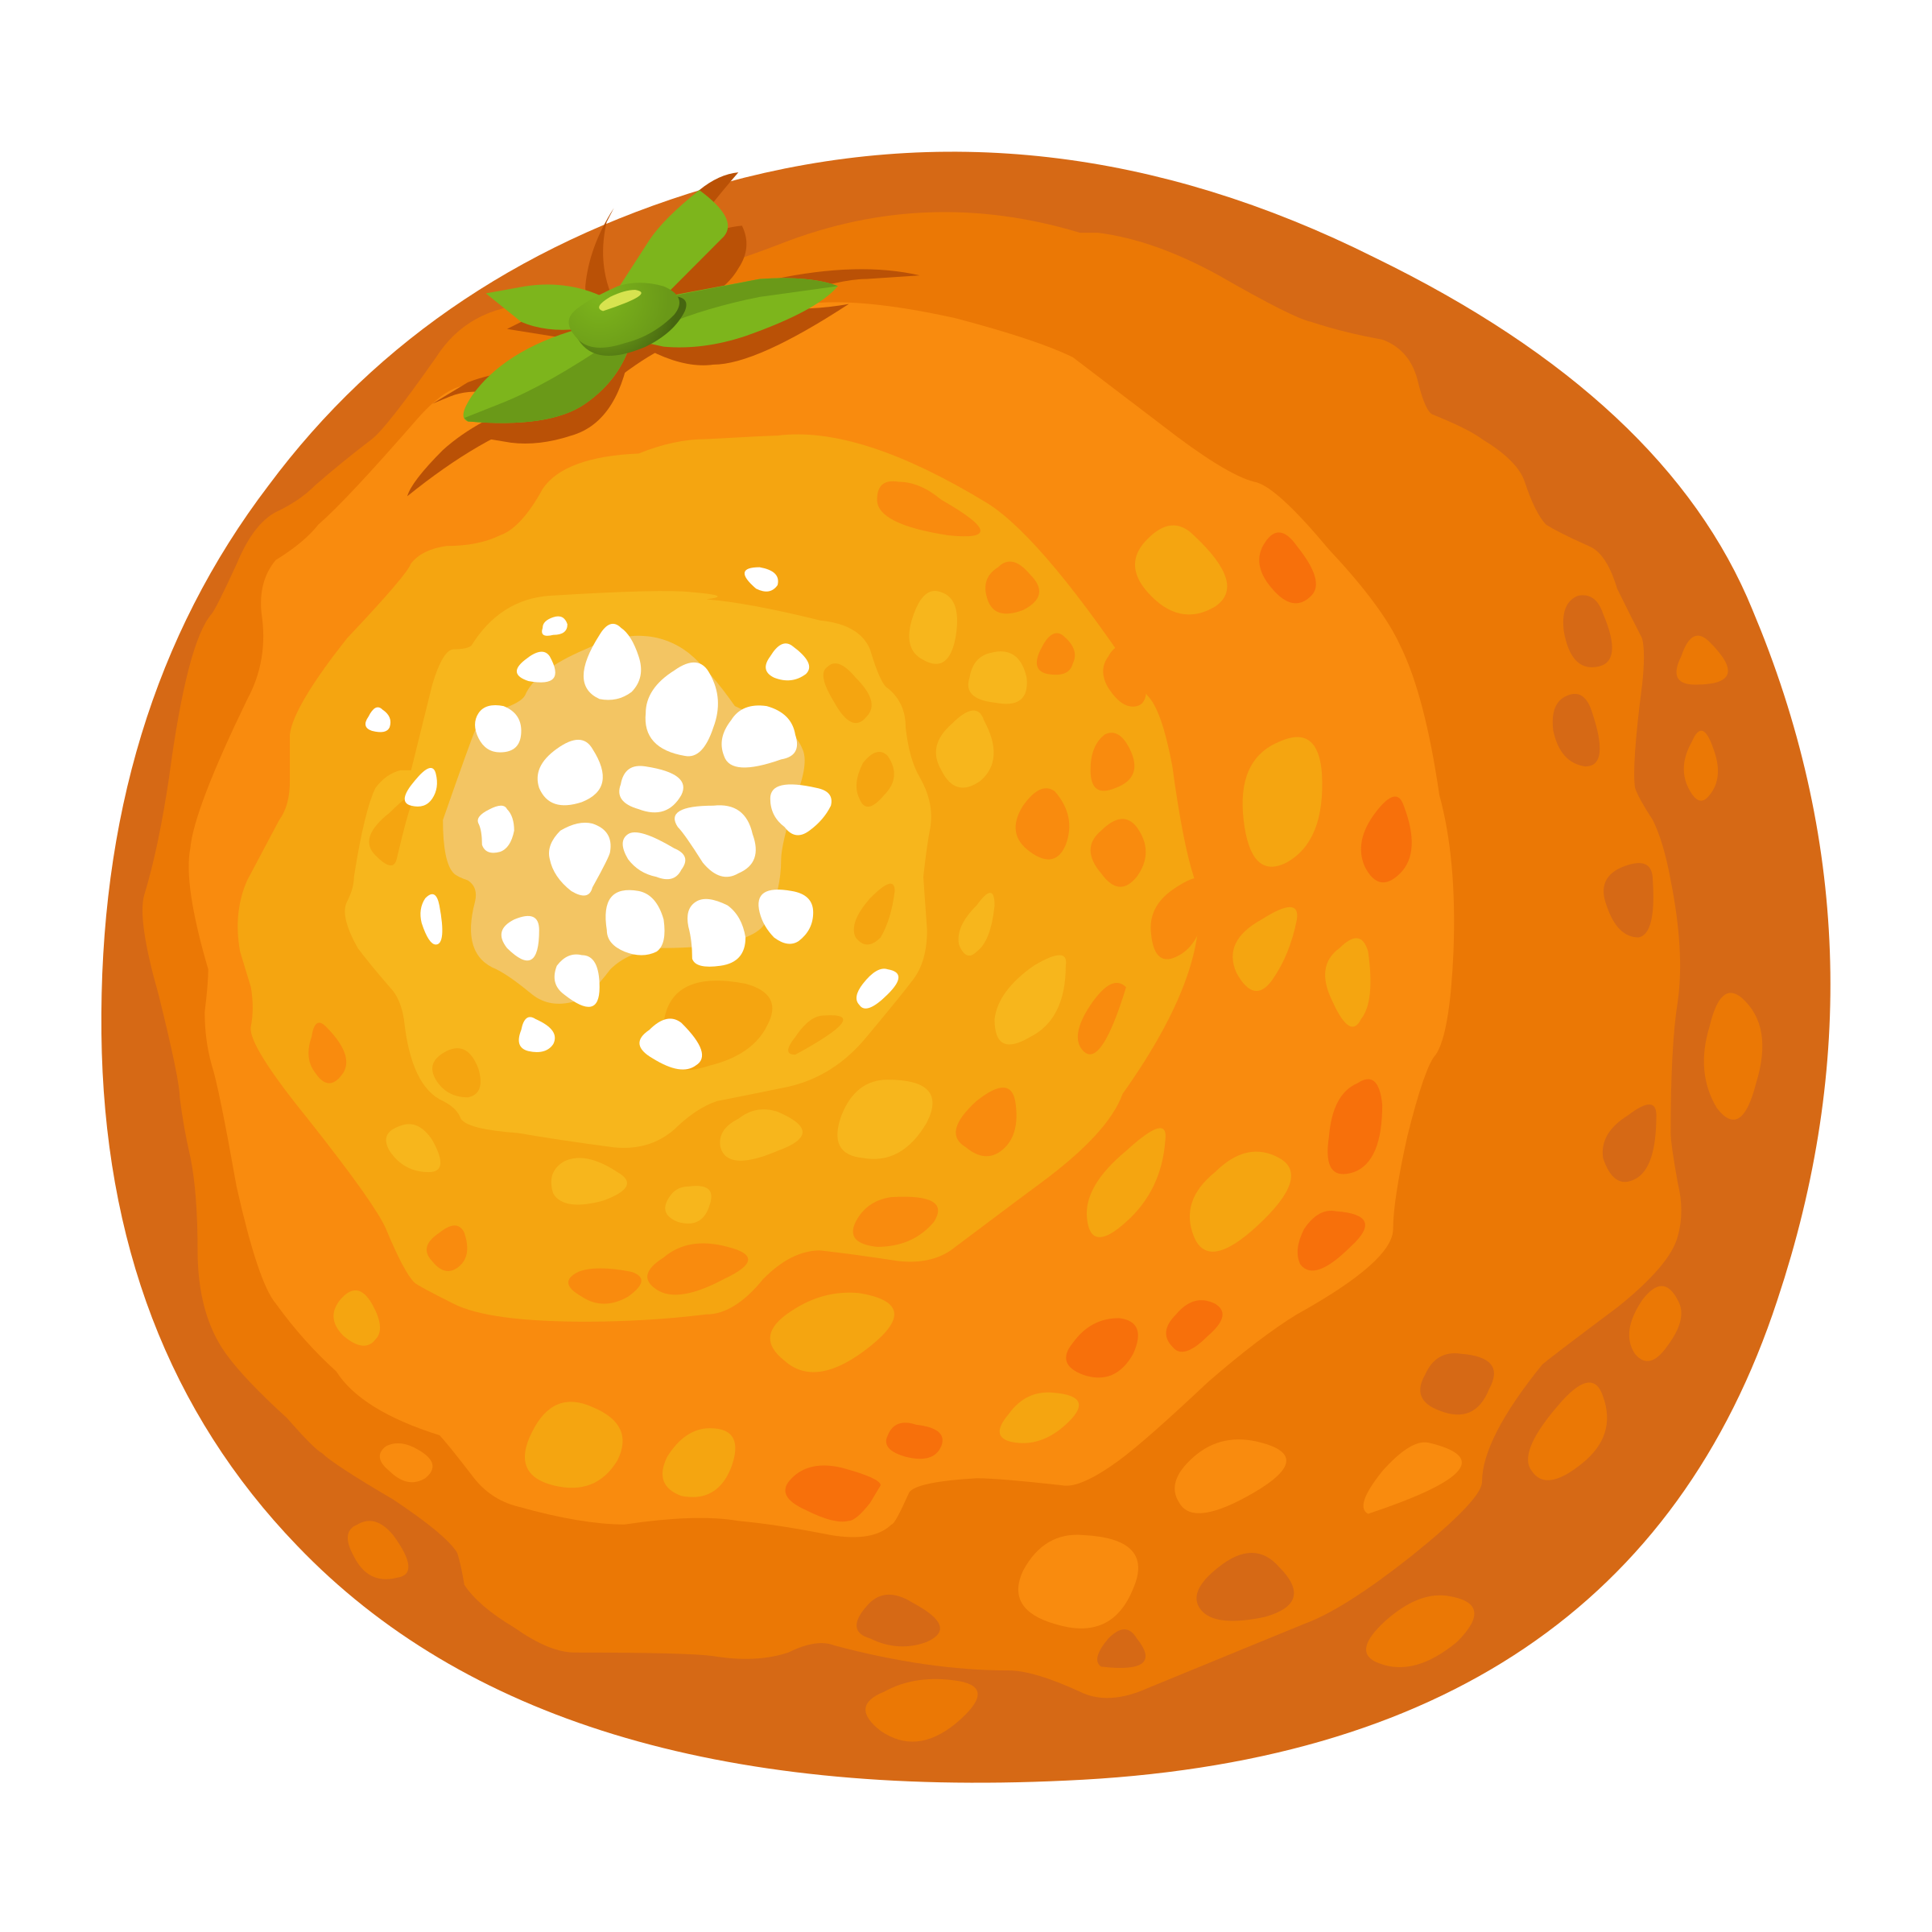 Orange big image png. Clipart food animated